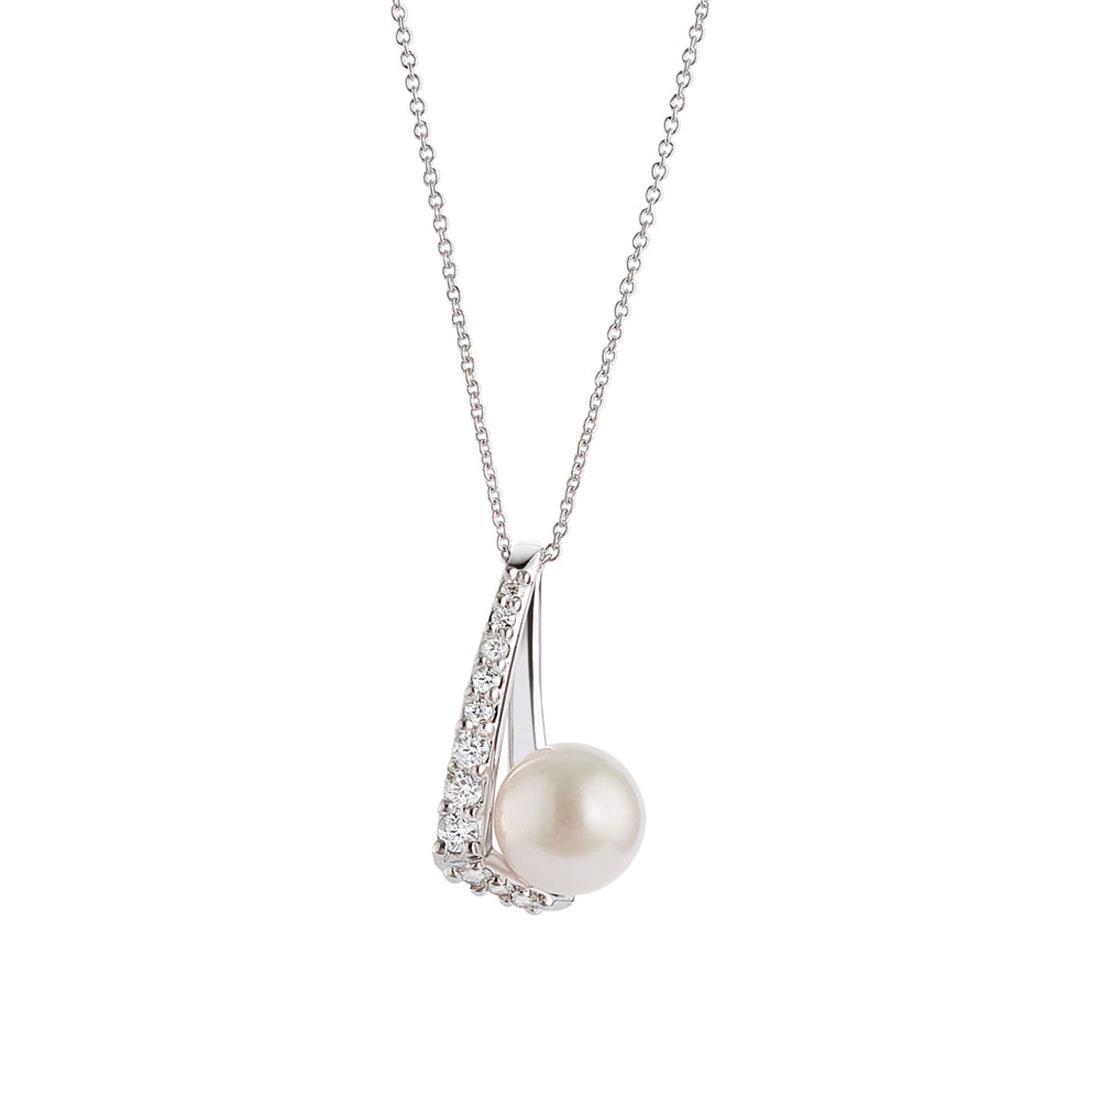 Necklace with Akoya pearl  - ALFIERI & ST. JOHN